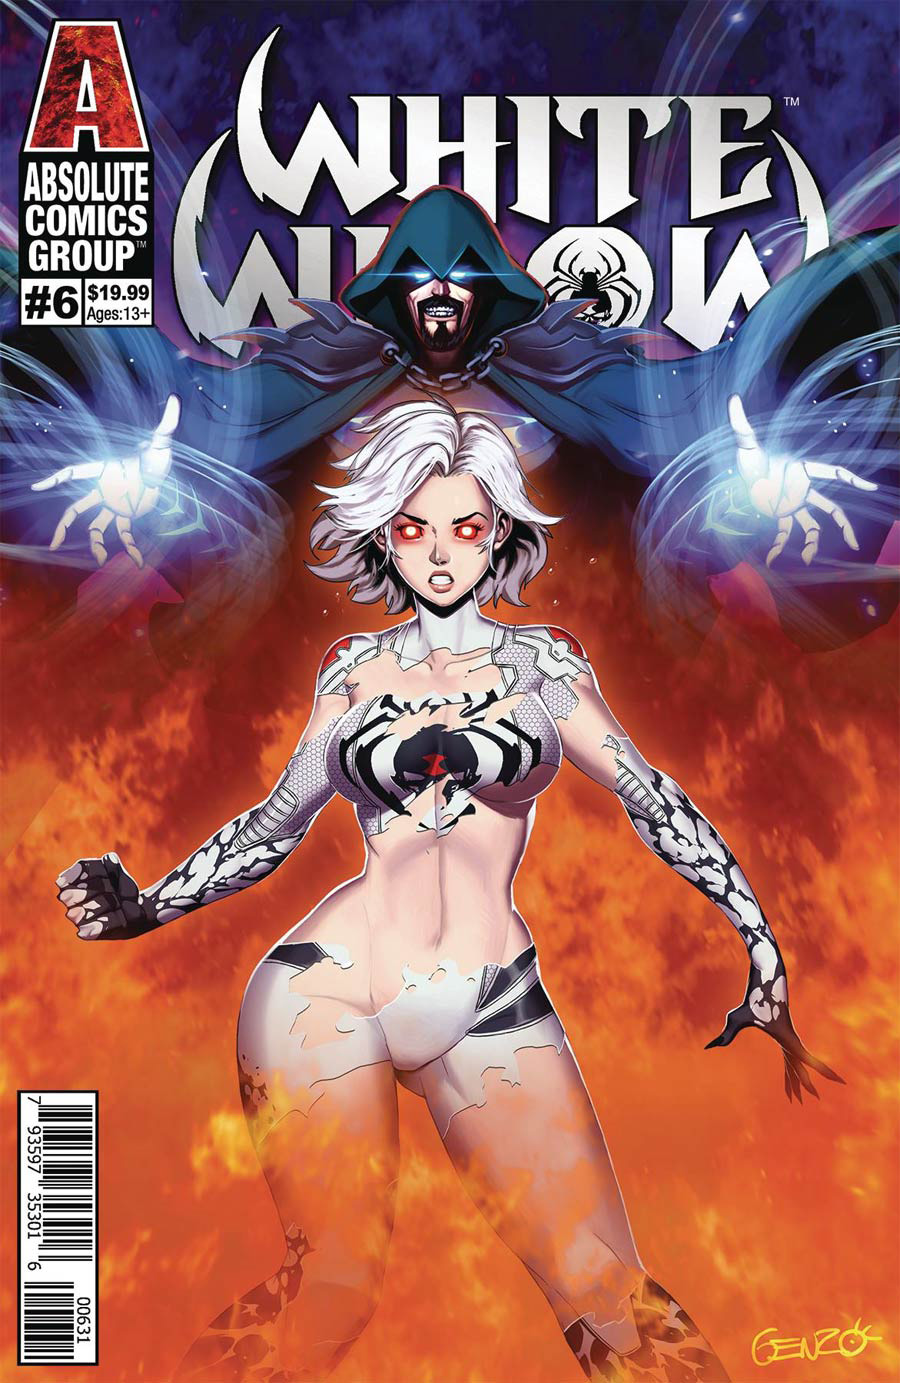 White Widow #6 Cover C Variant Genzoman Wraparound Lenticular Cover